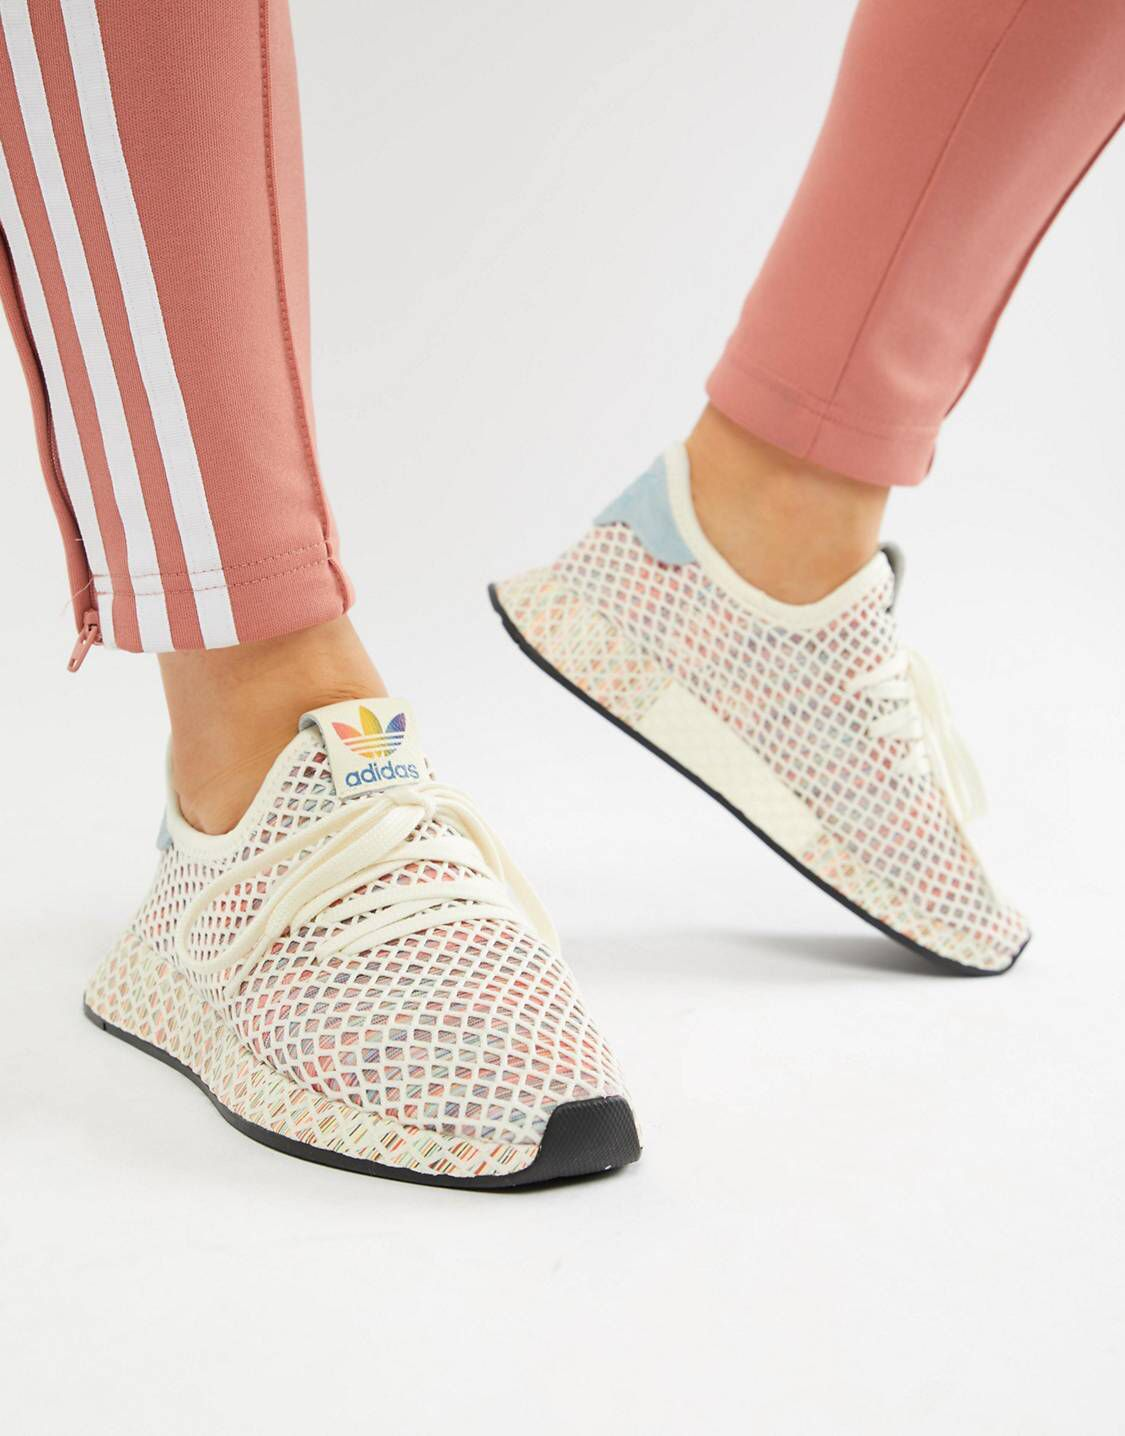 Adidas Originals – Pride Deerupt – Sneaker aus Netzstoff in